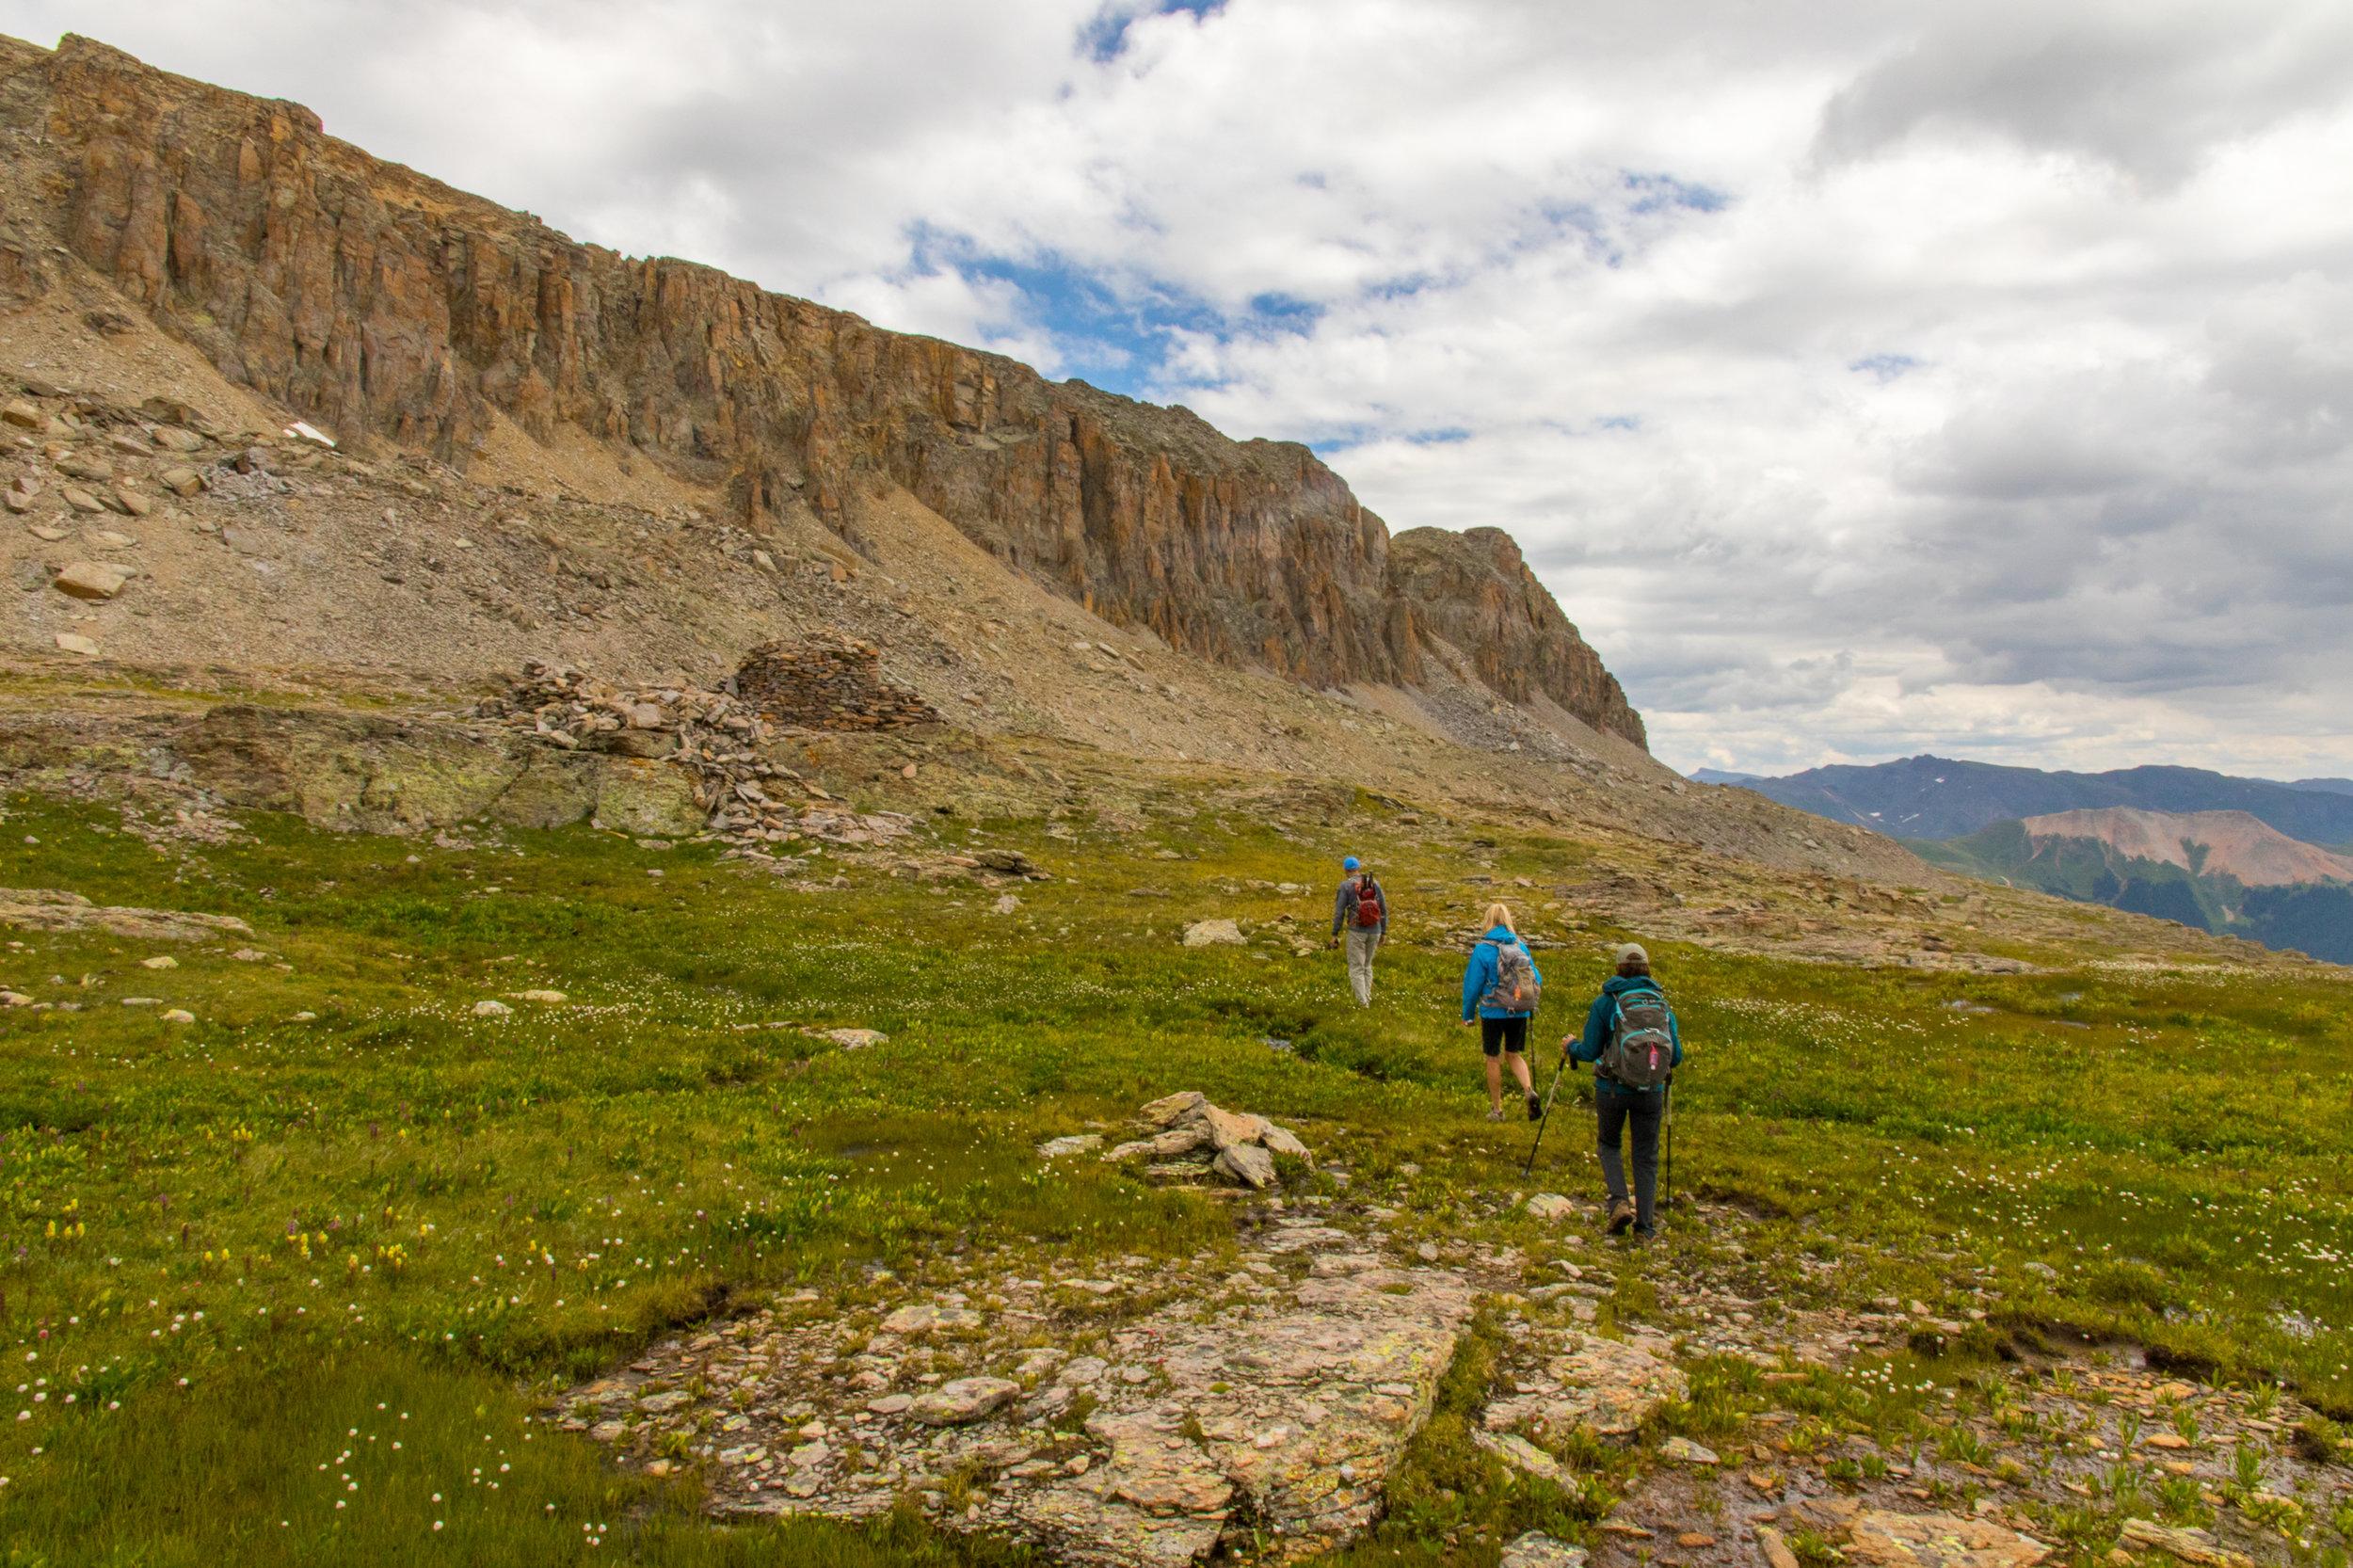 Tim, Angela & Mary hiking down from Columbine Lake